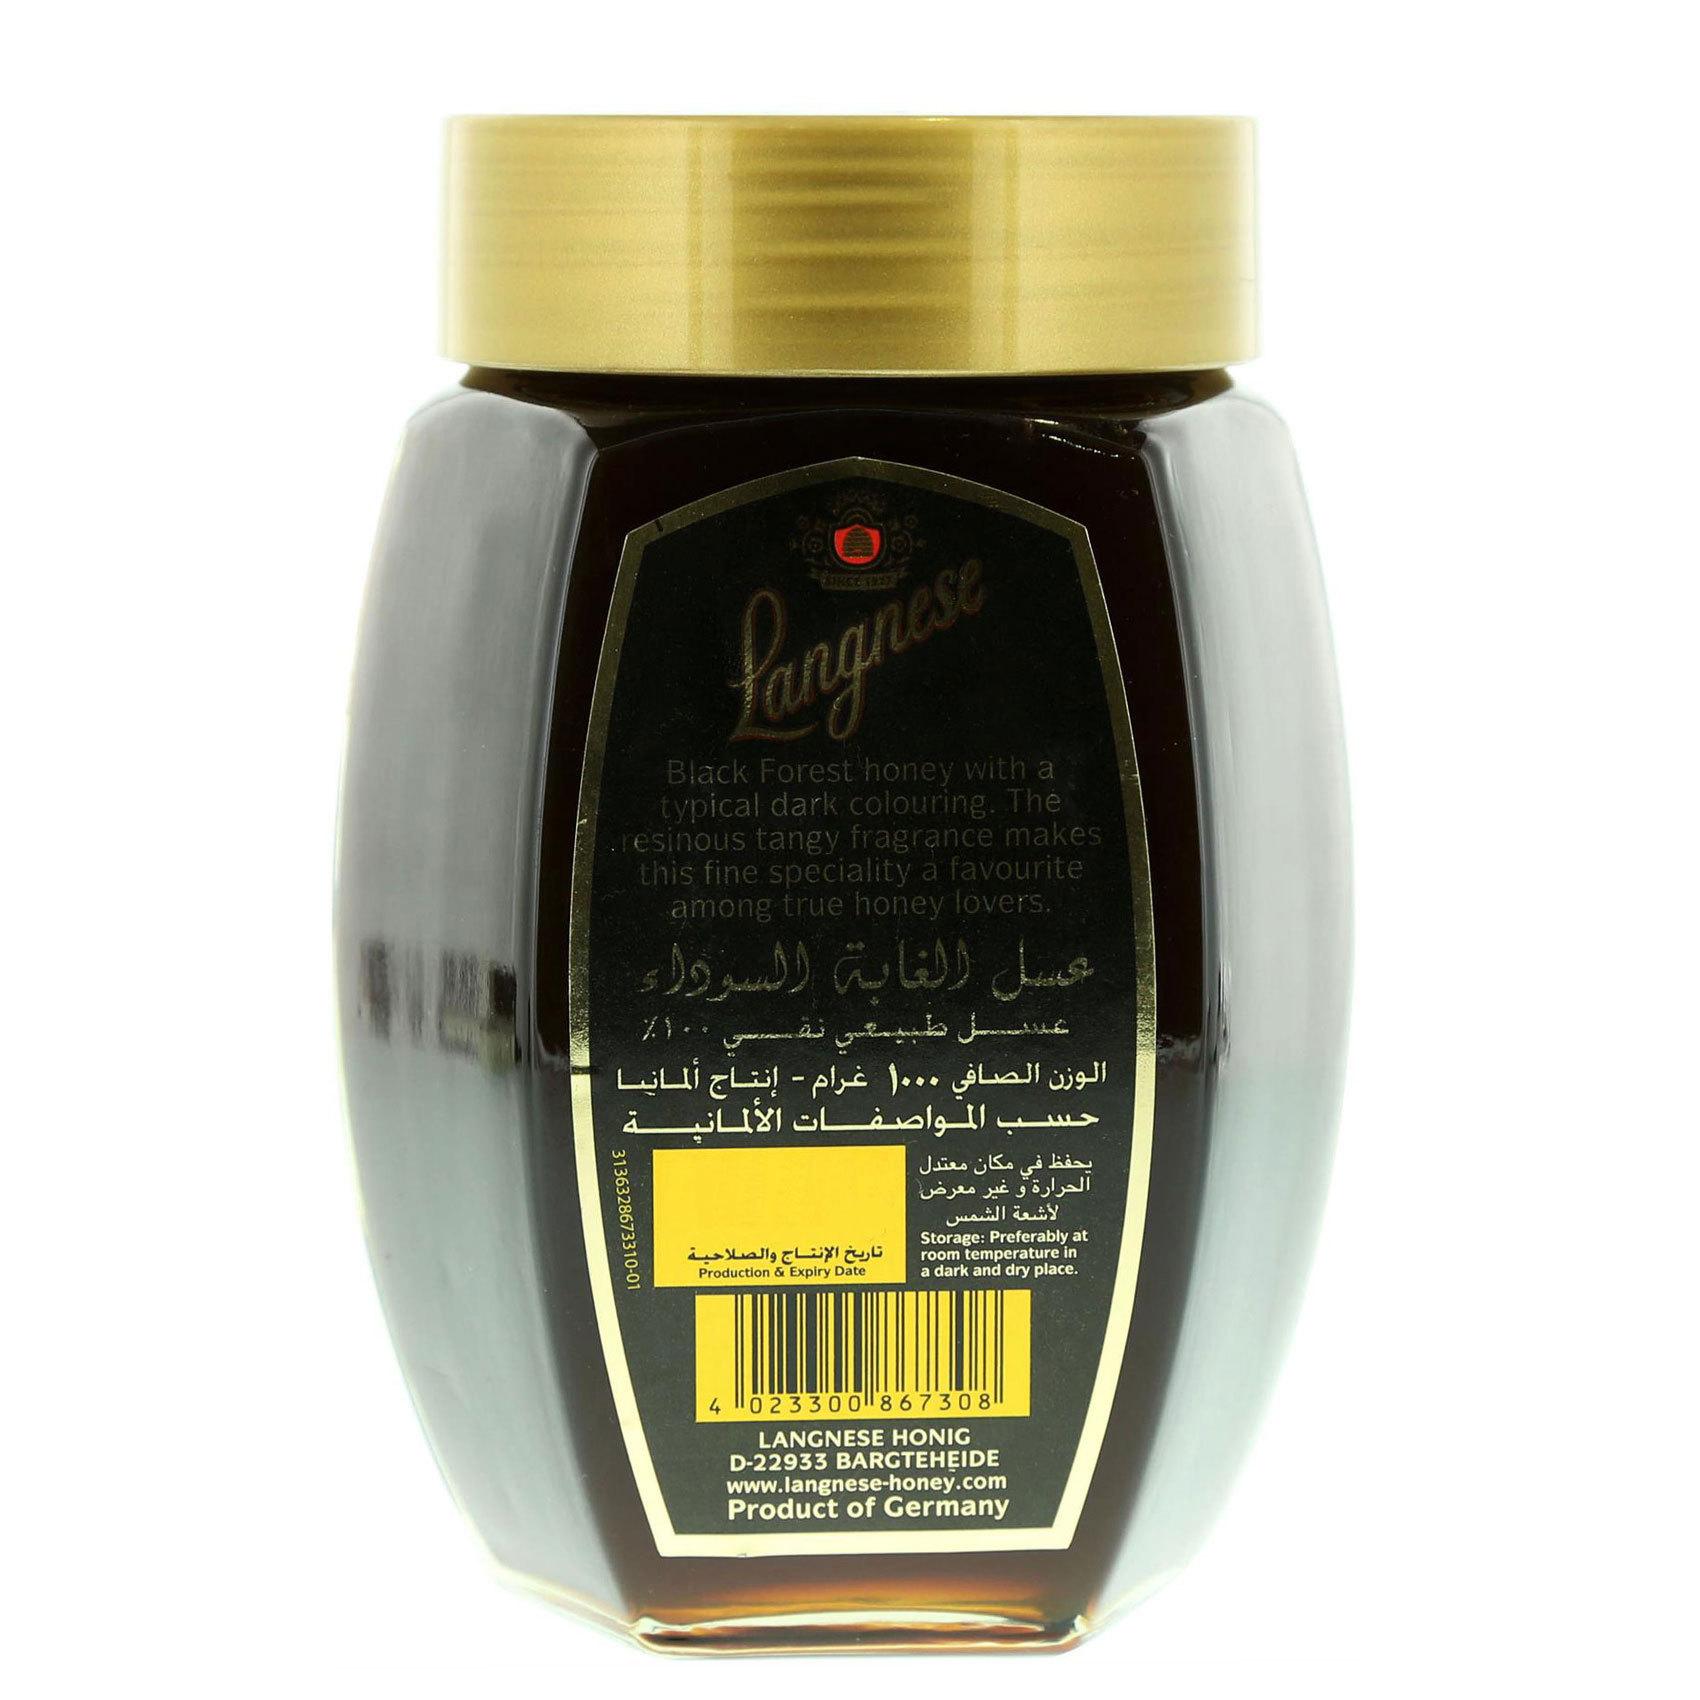 LANGNESE BLACKFOREST HONEY  JAR 1KG